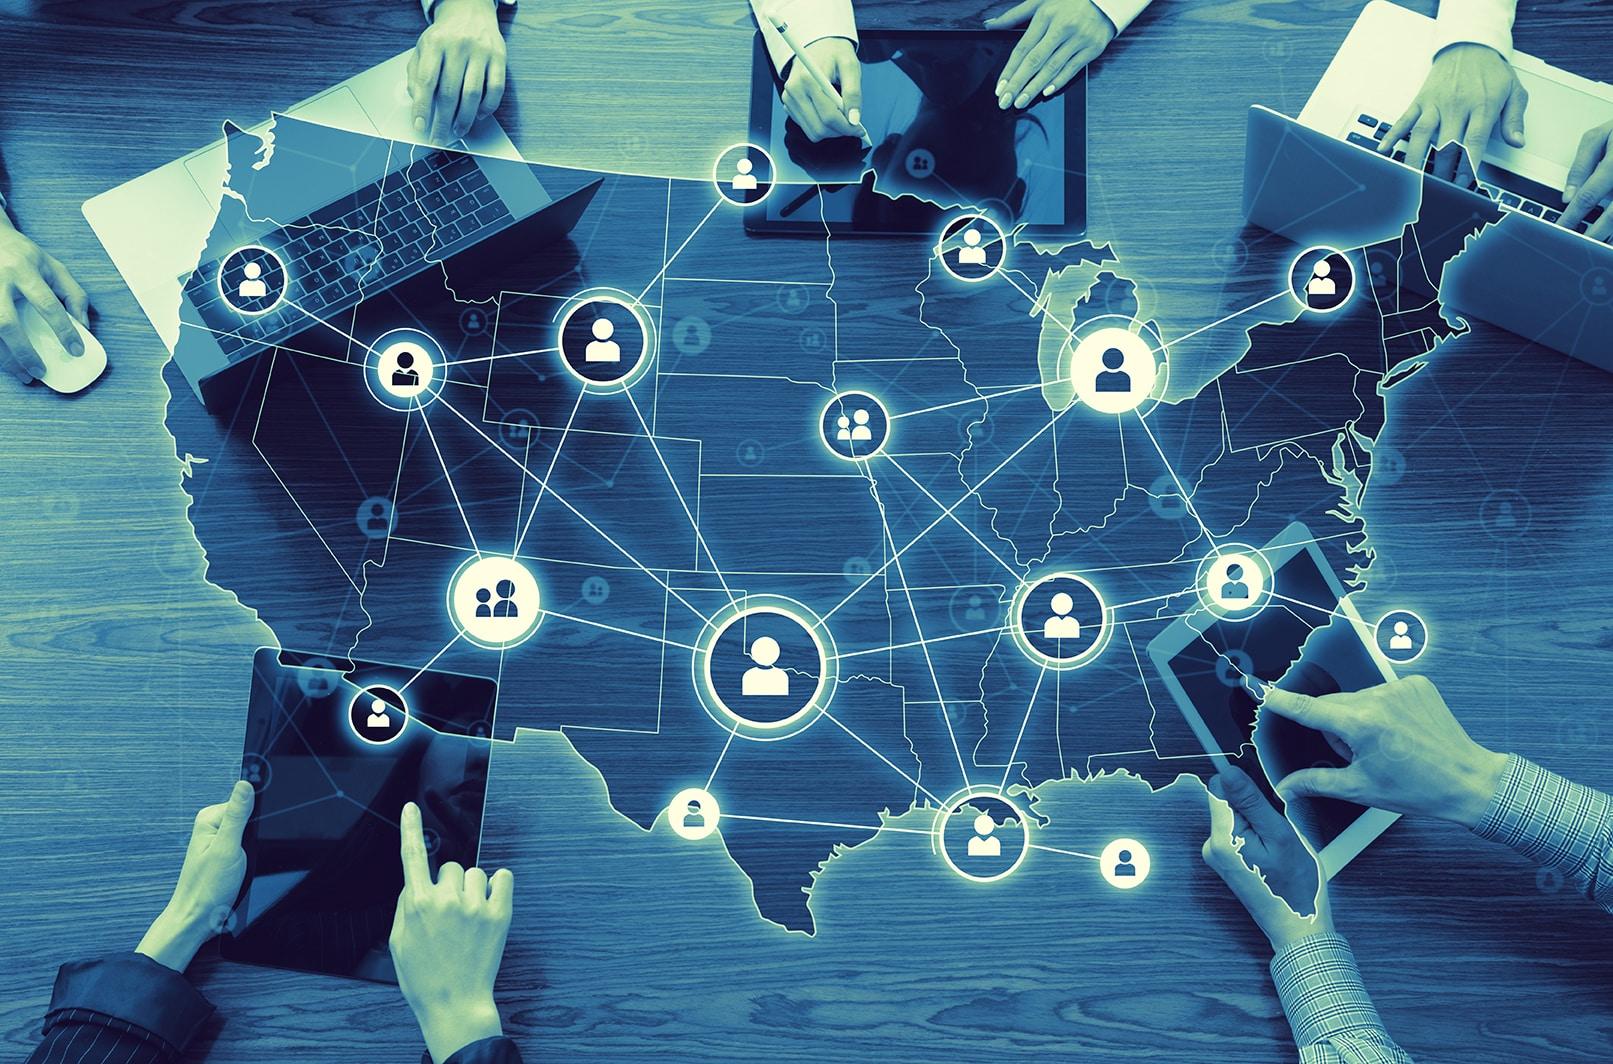 Metadata: where should I enable flow data?